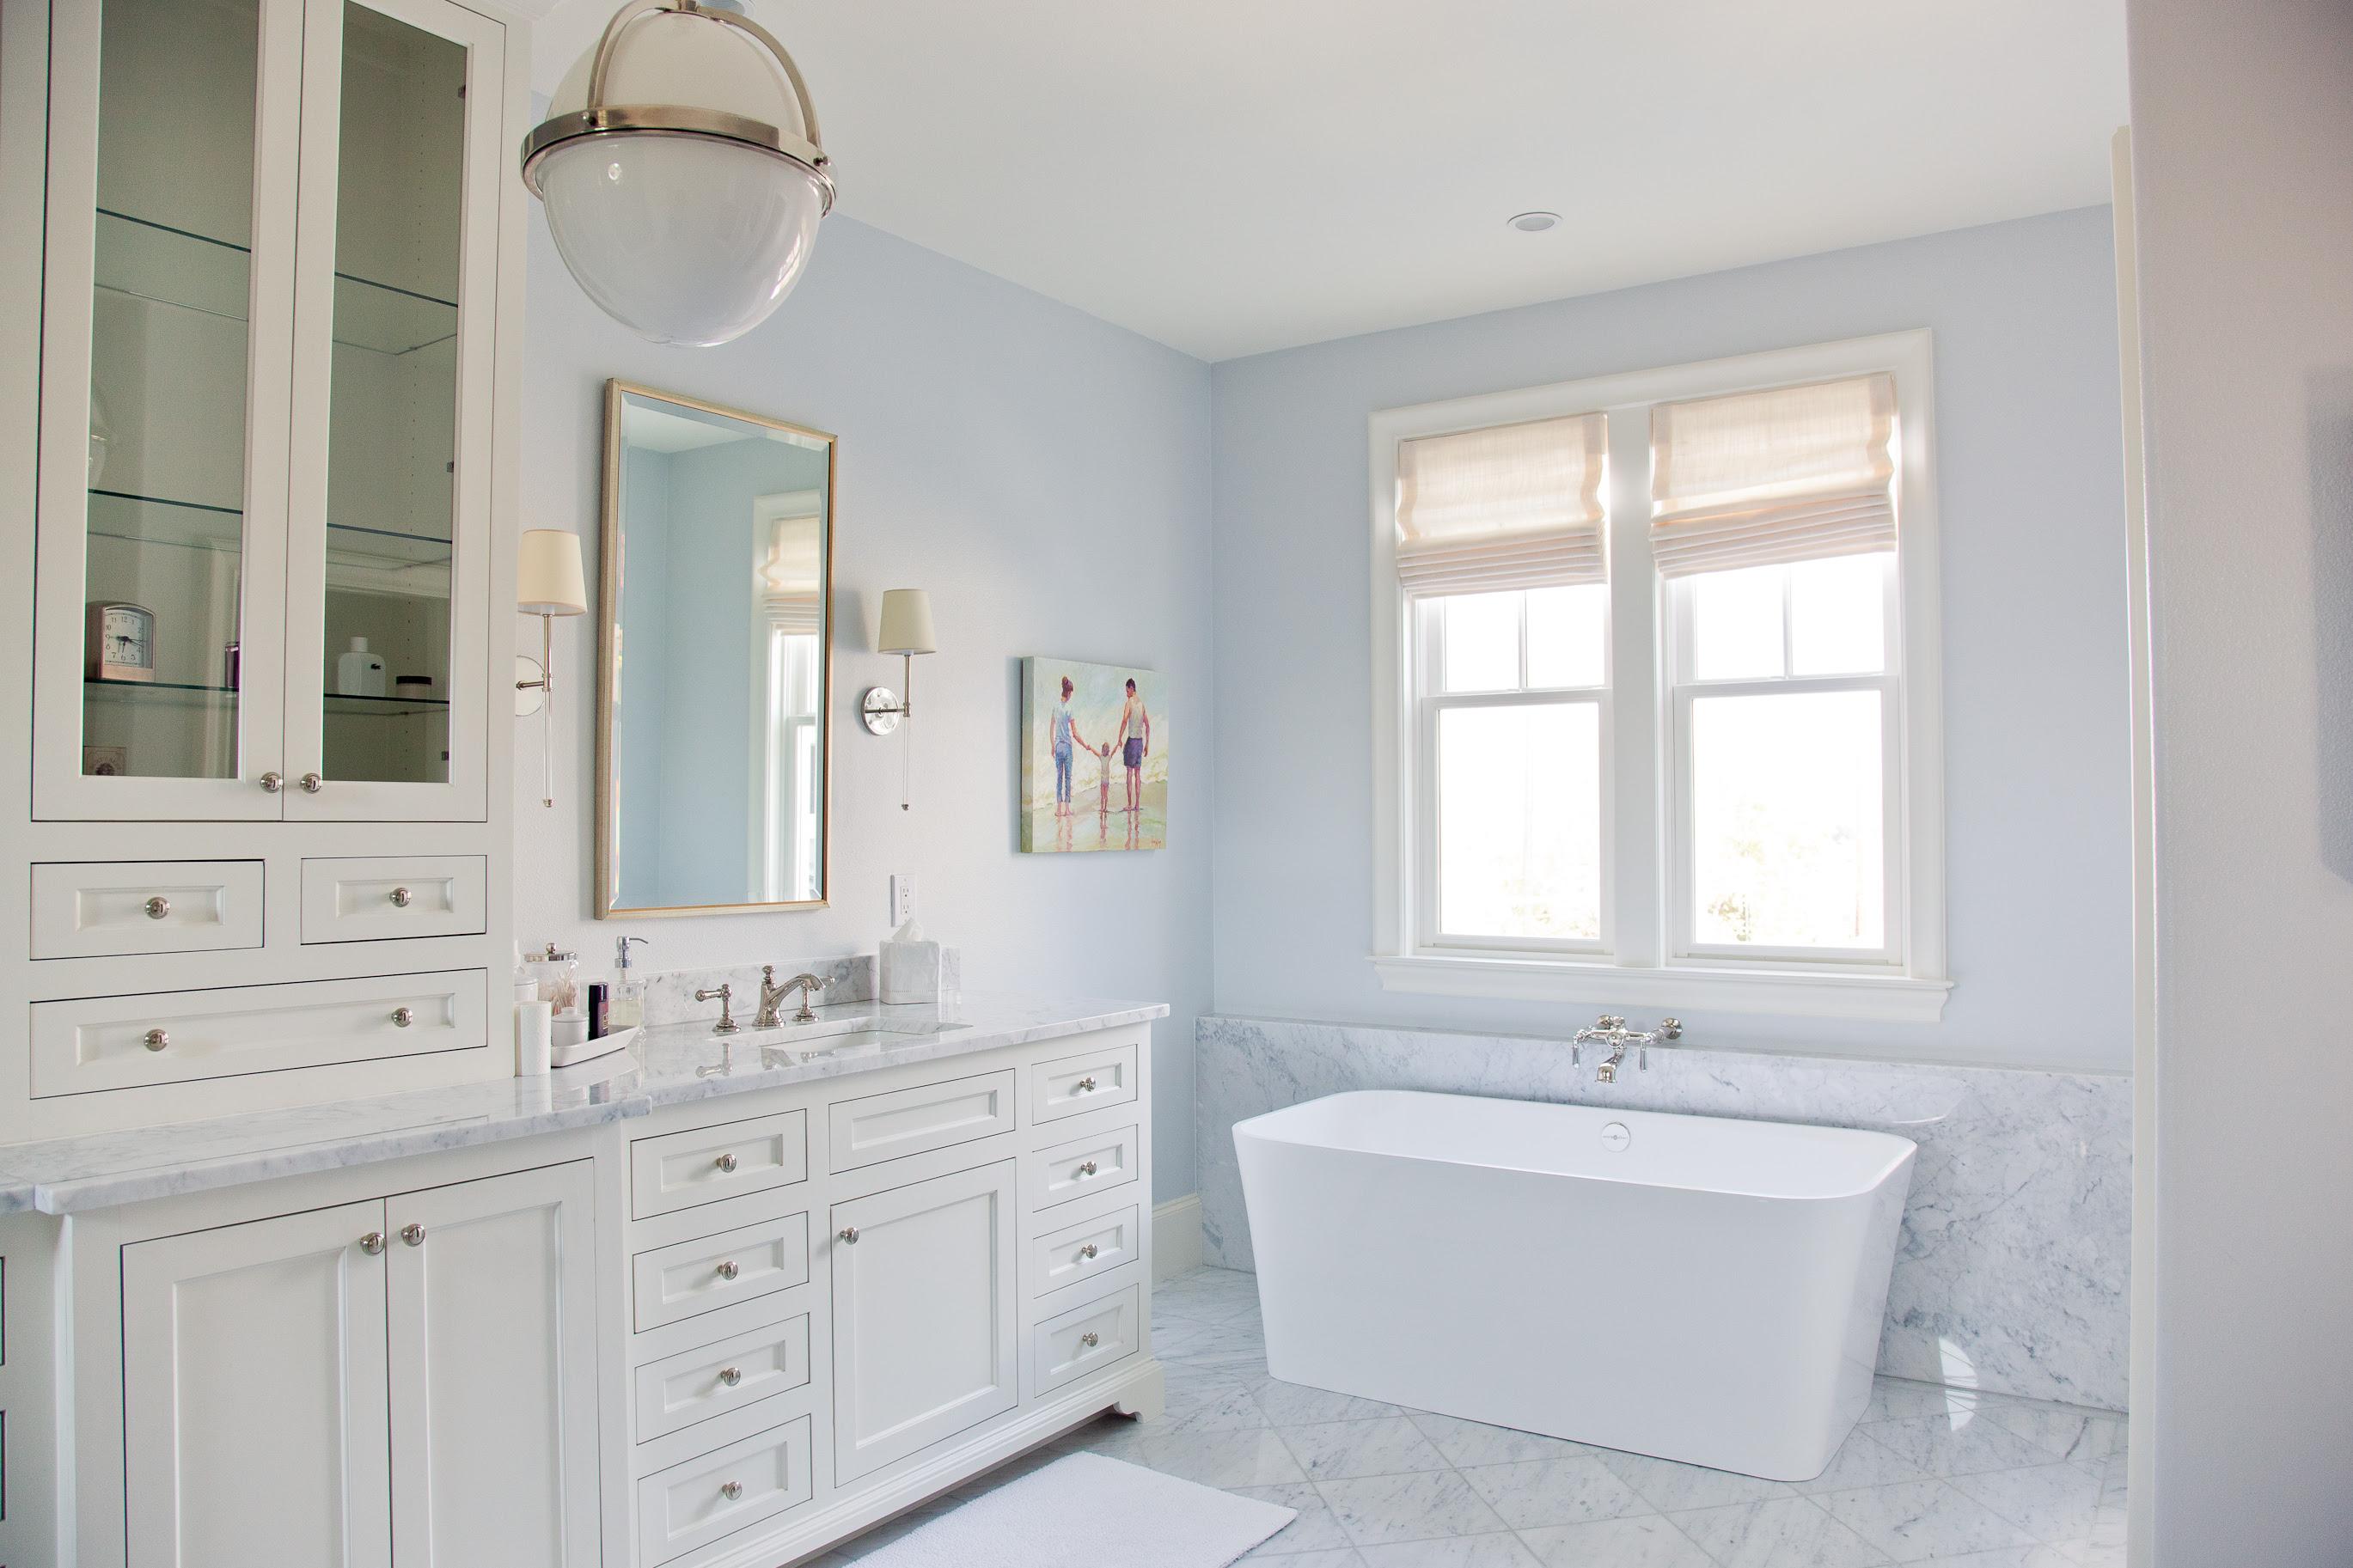 Wall Mount Faucet For Freestanding Bathtub Wall Design Ideas